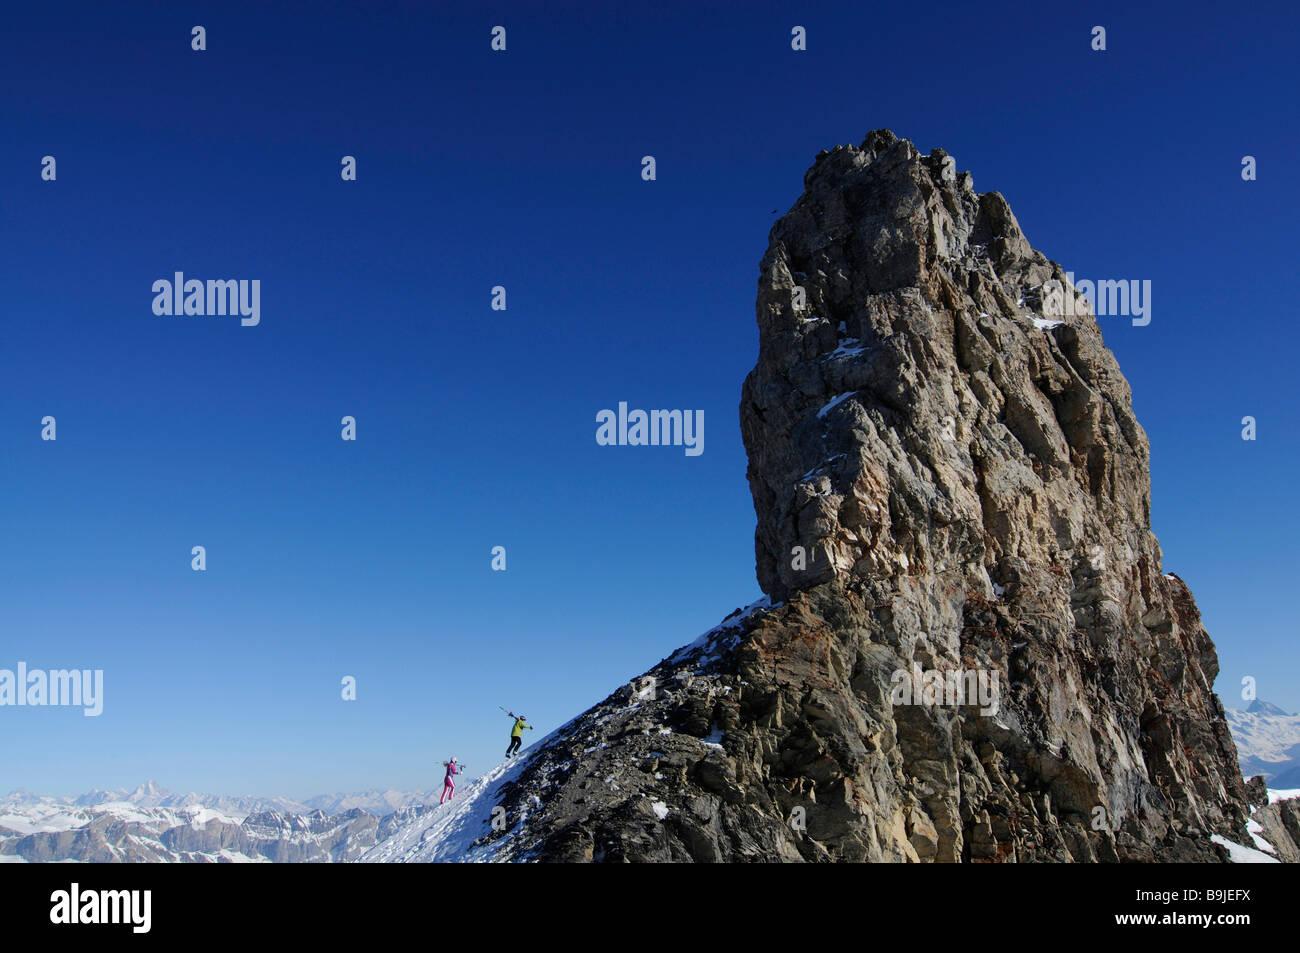 Skifahrer auf Tour Saint-Martin, Col du Pillon, Ski Region Glacier 3000, Gstaad, Westalpen, Berner Oberland, Schweiz, Stockbild